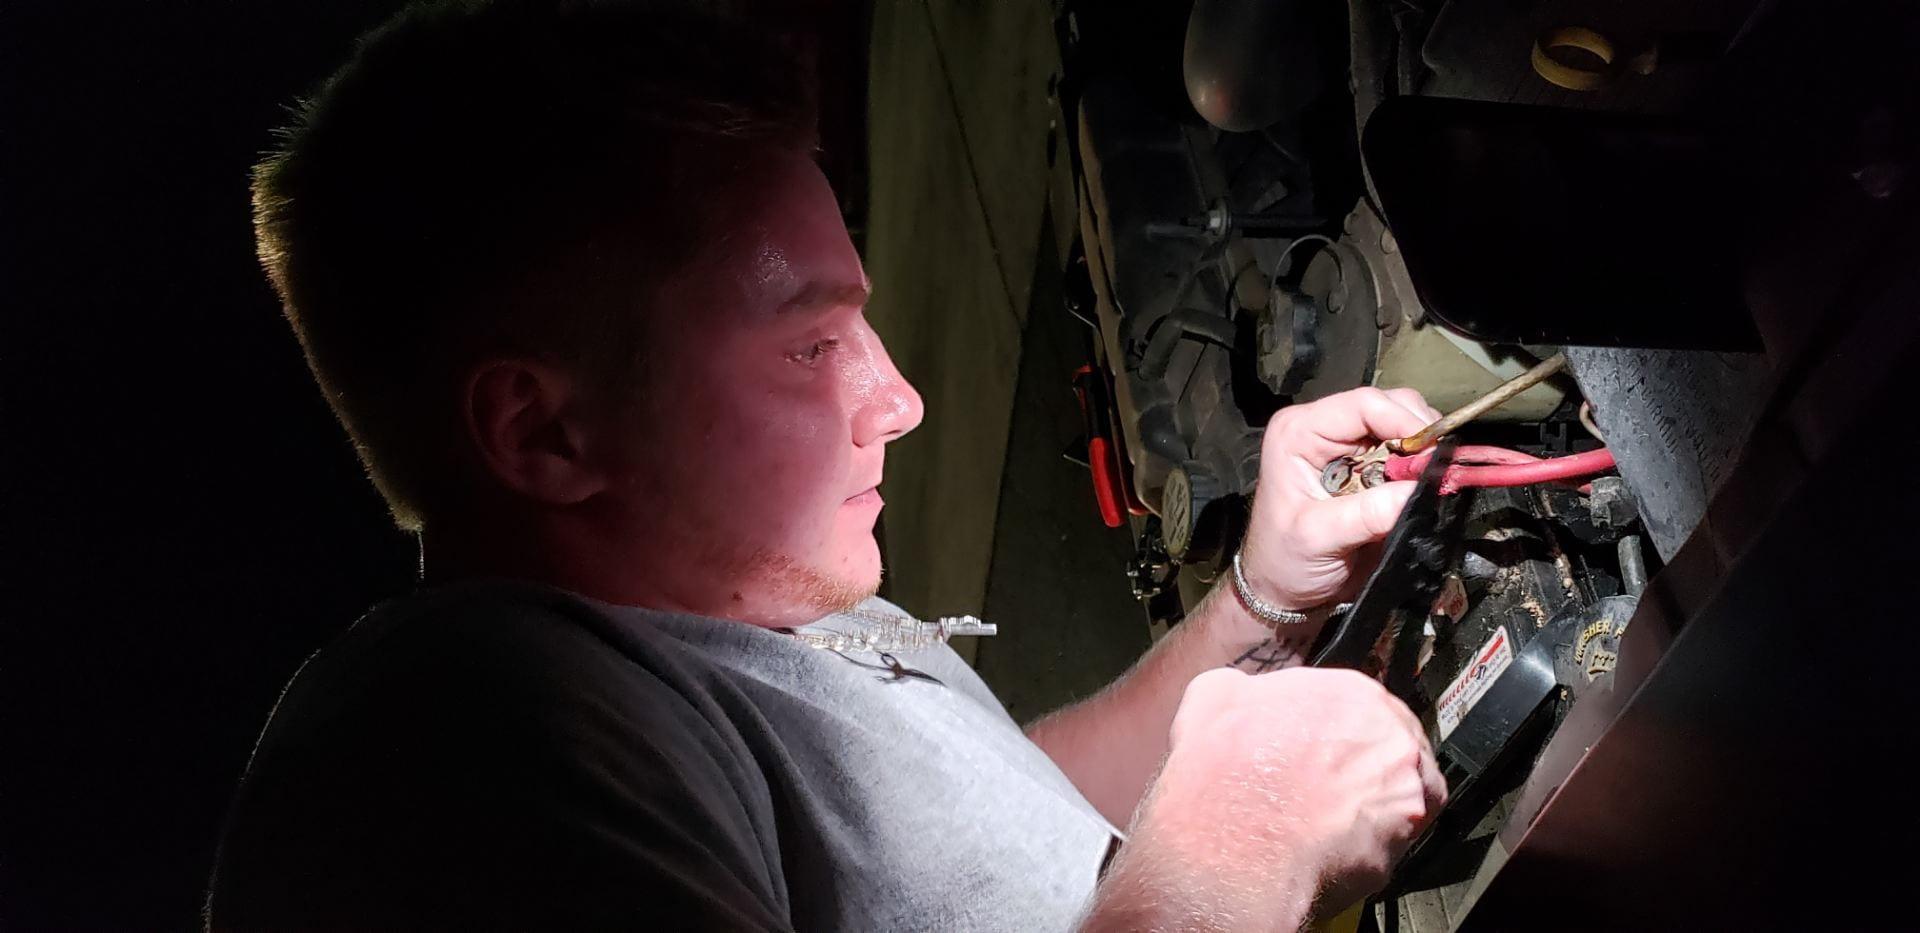 chris fixing battery